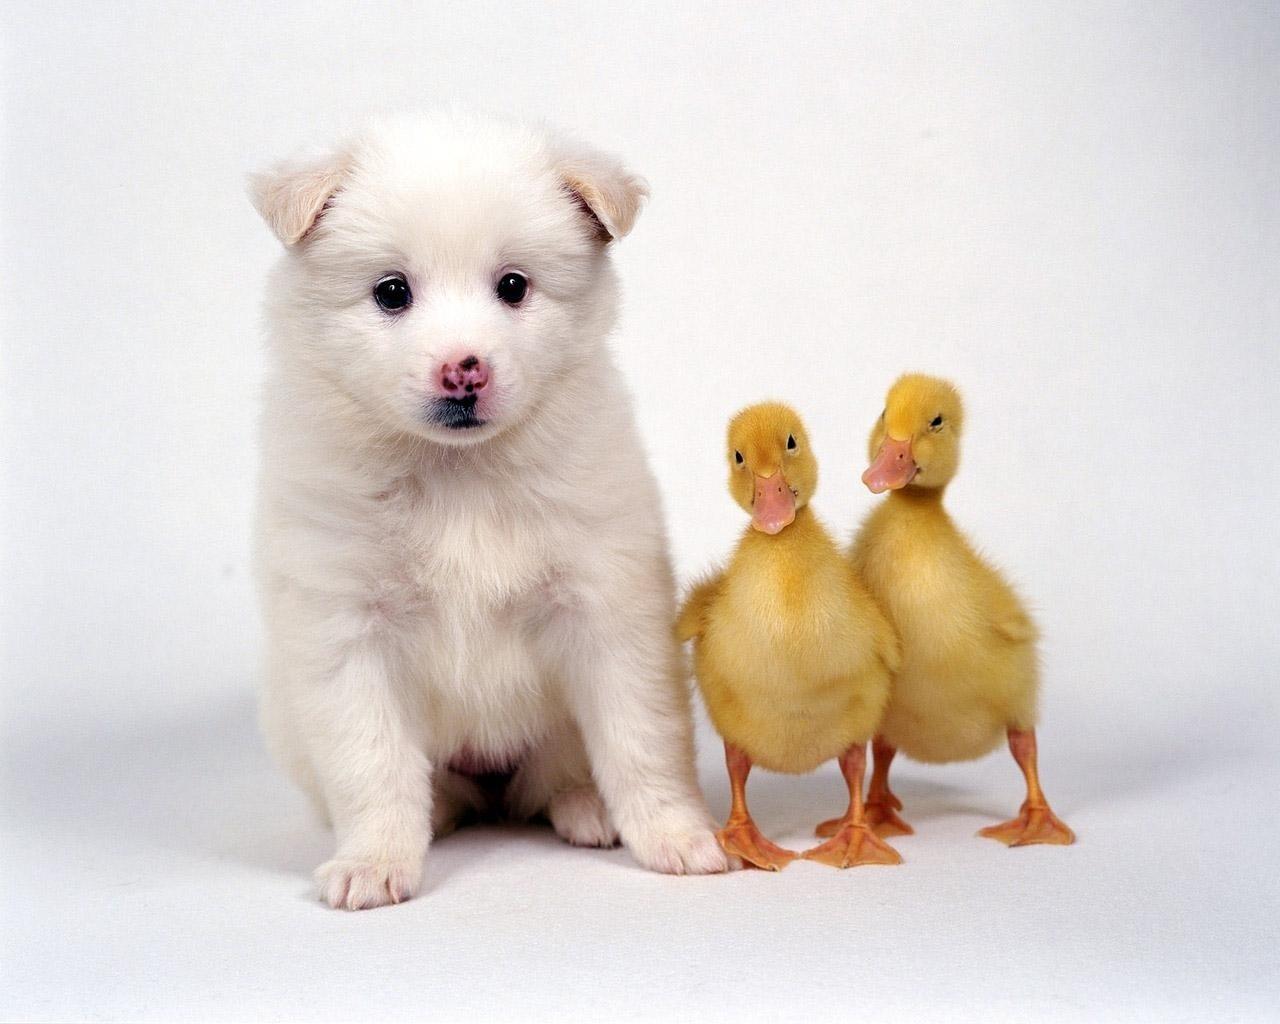 Cute Animal Wallpapers Top HD Wallpapers 1280x1024